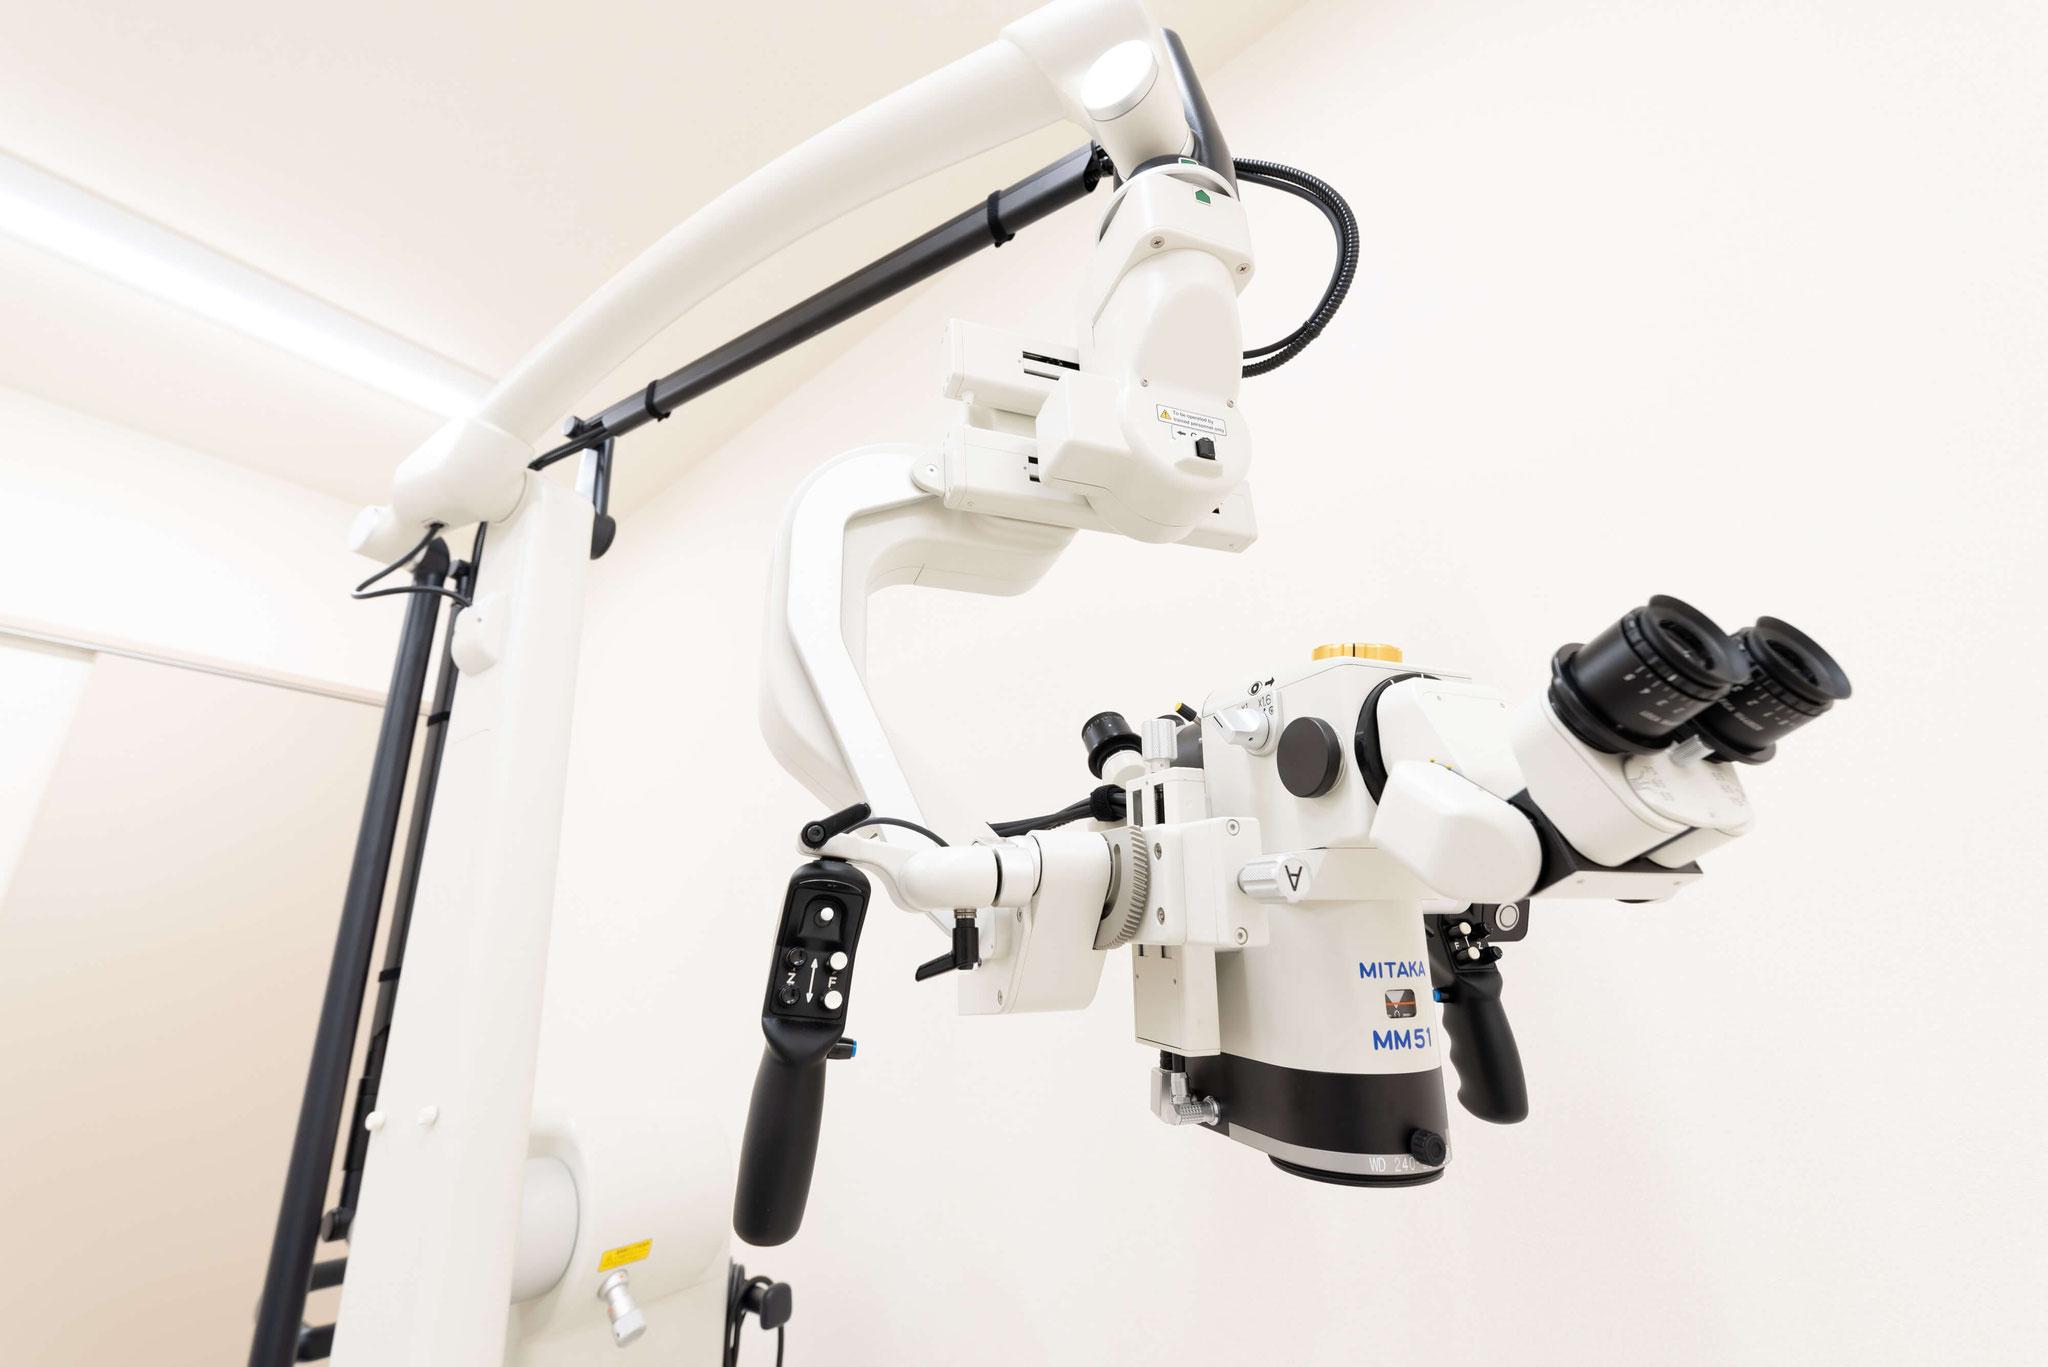 Super-Microsurgery Microscope, Mitaka Corporation, Lymphedema Treatment Japan